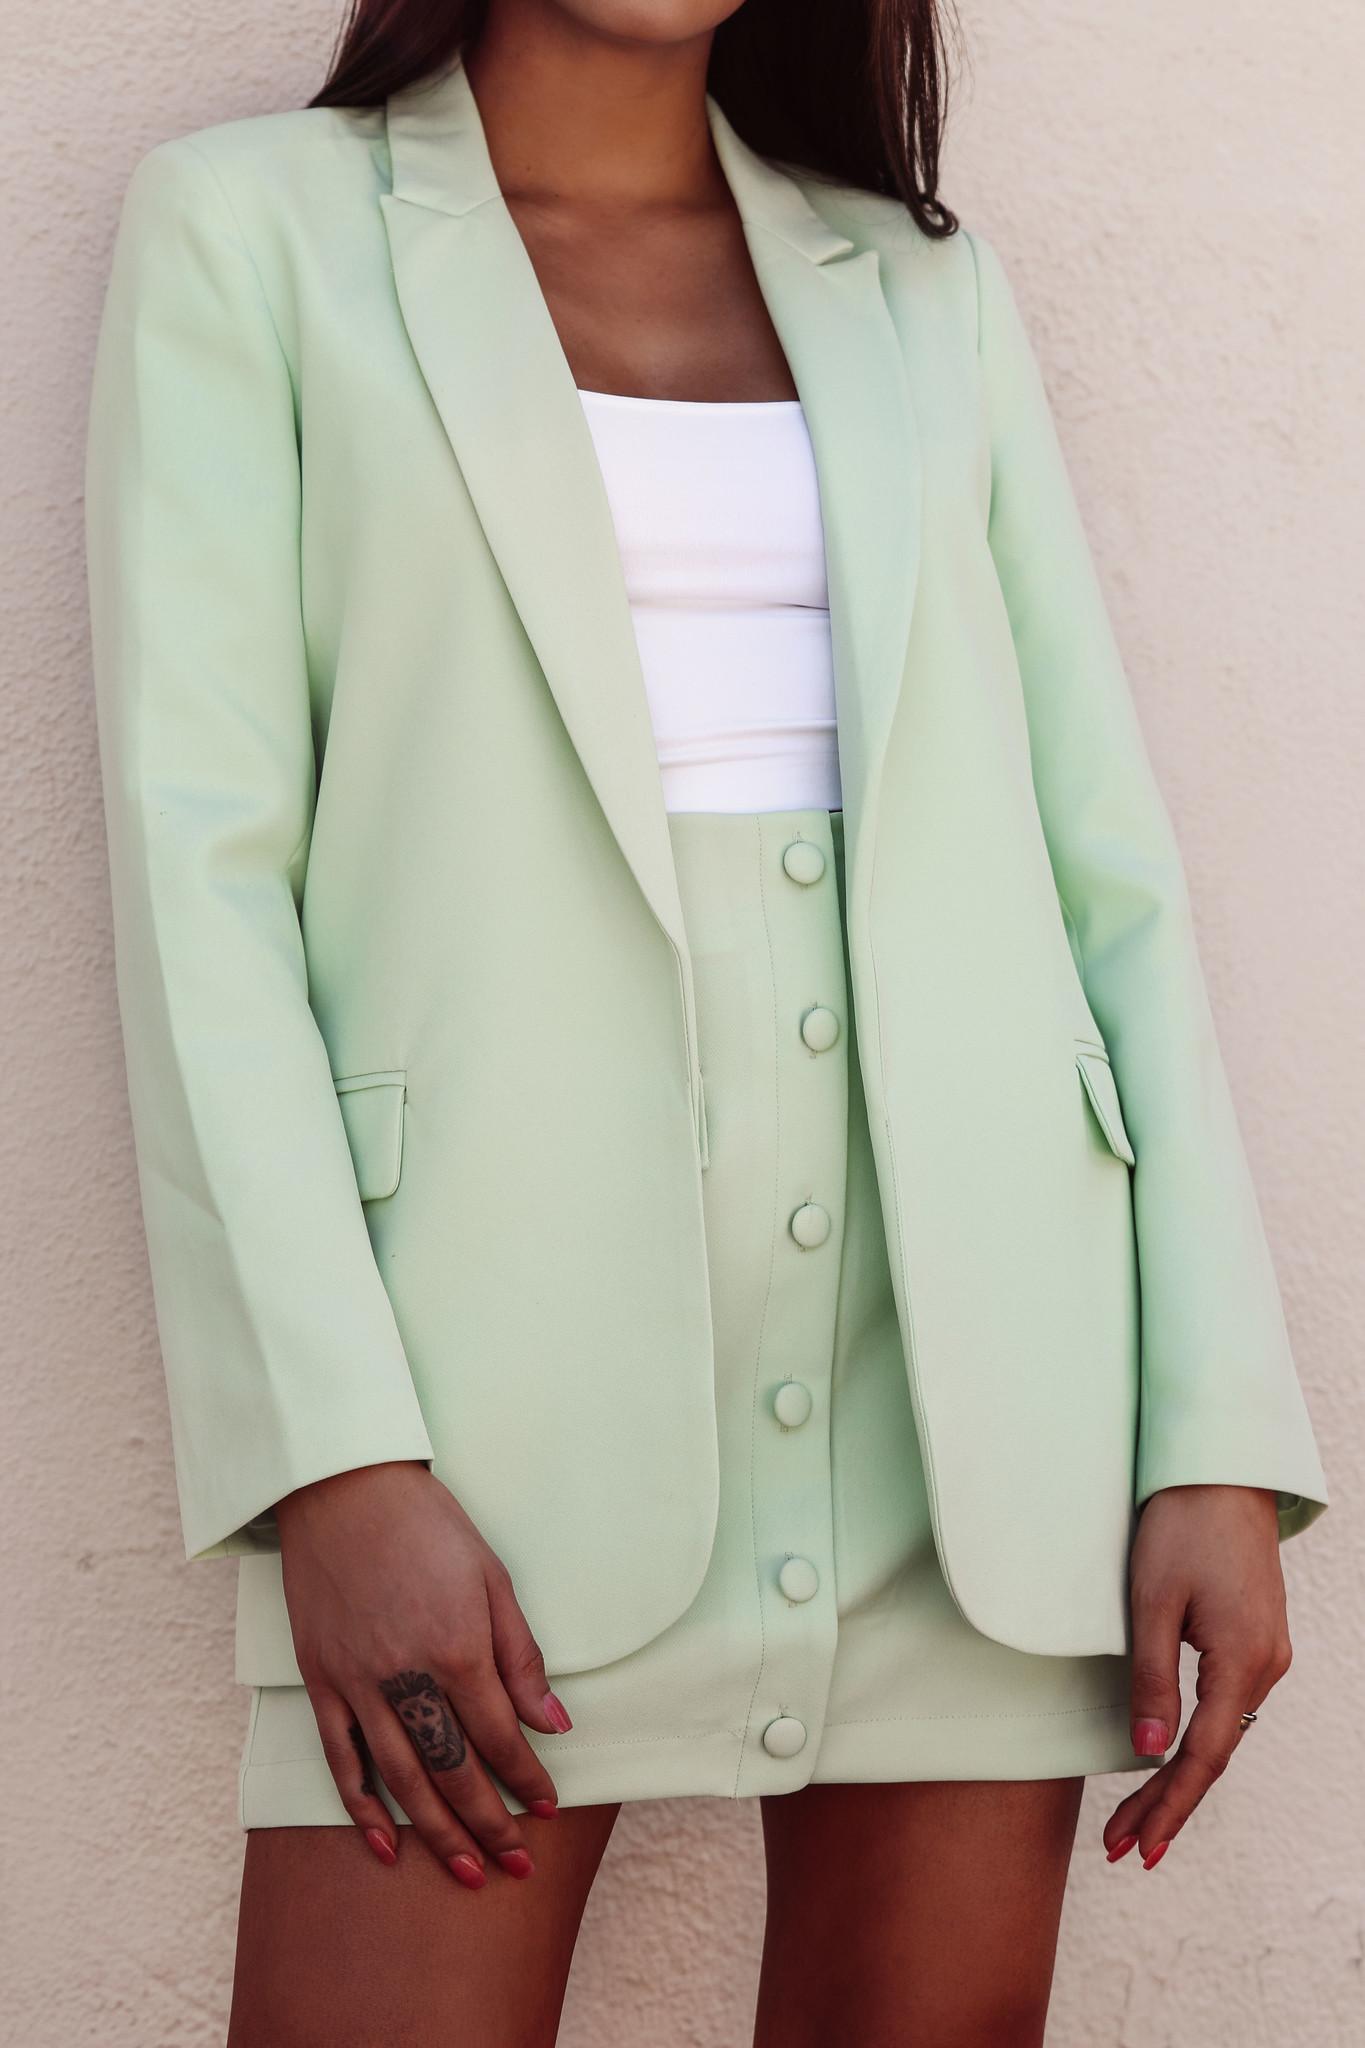 LEXI DREW 2557 Button Blazer